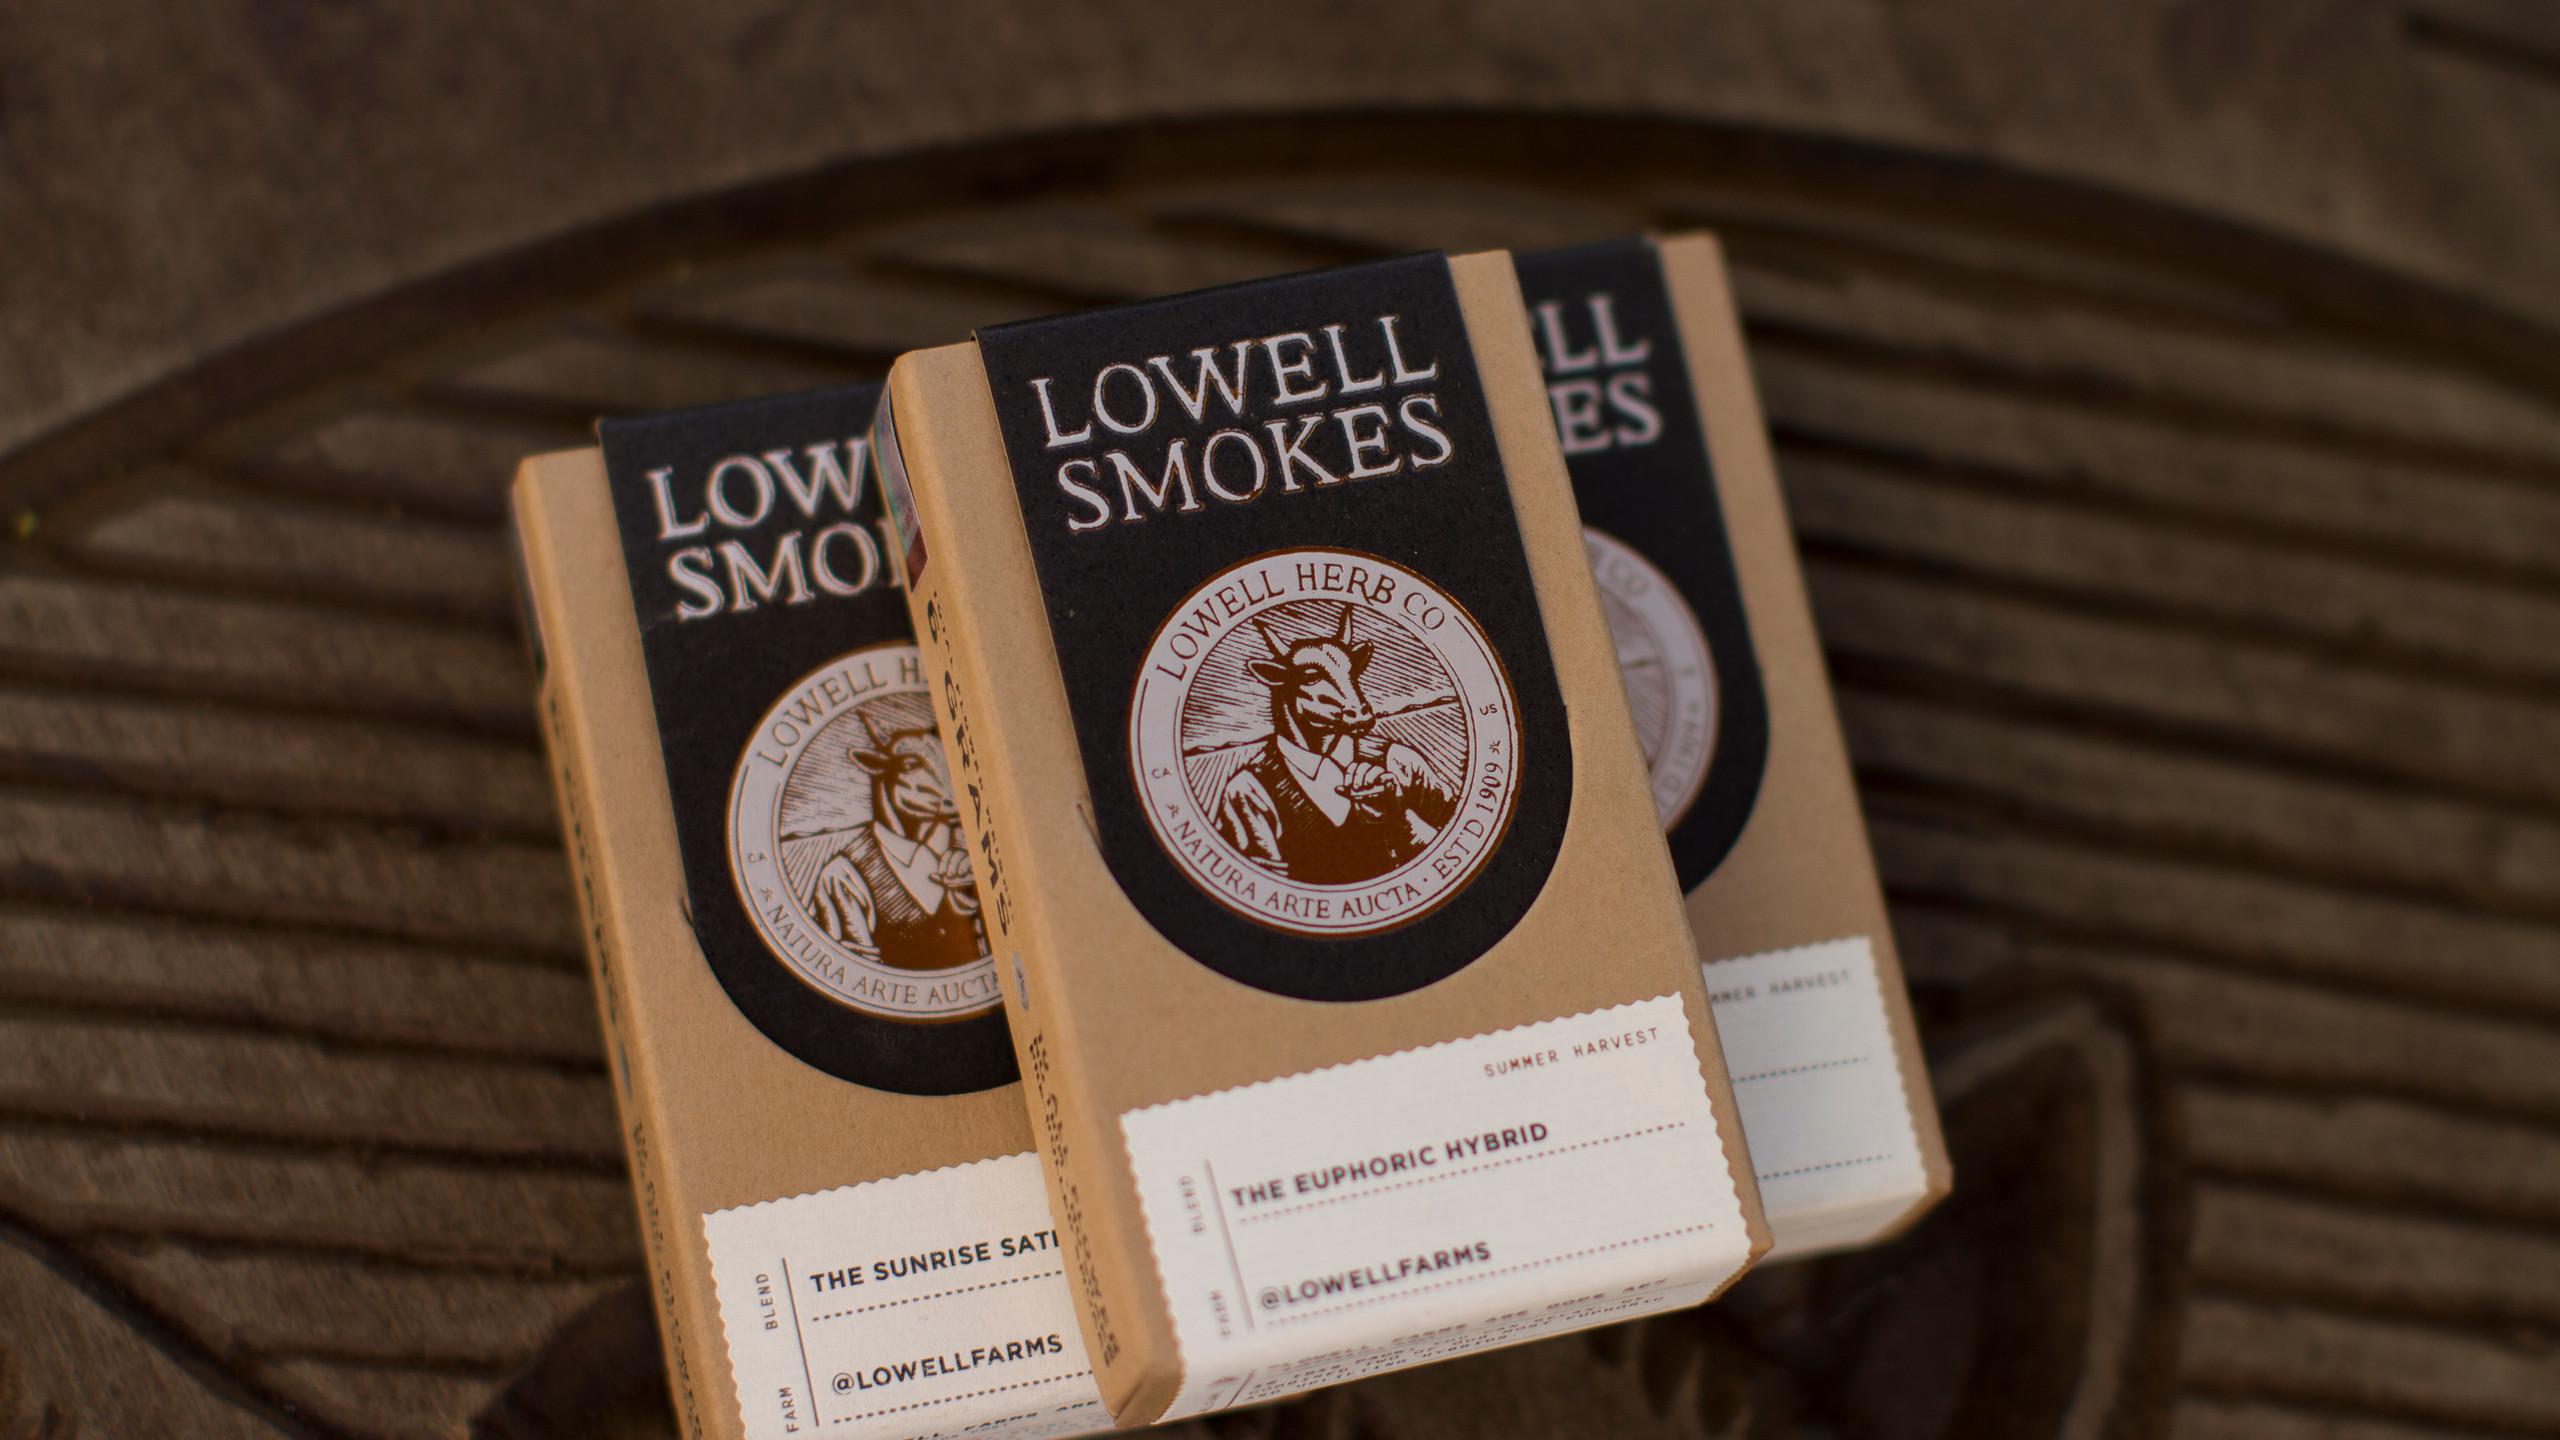 LowellSmokes